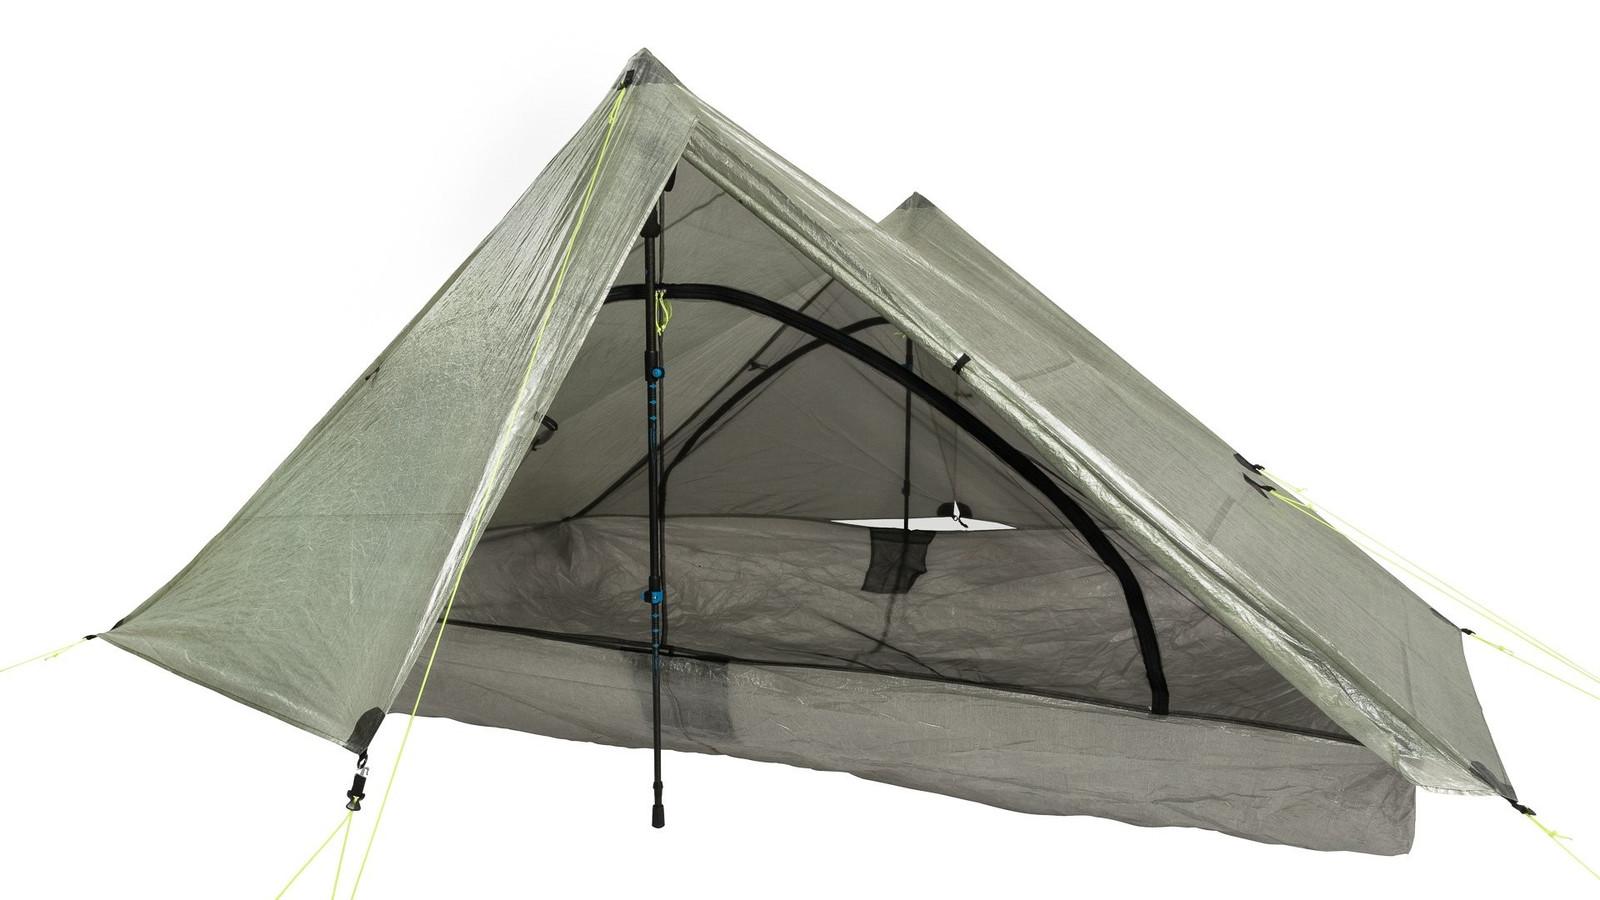 Zpacks Triplex ultralight tent 638g! + carbon fiber poles